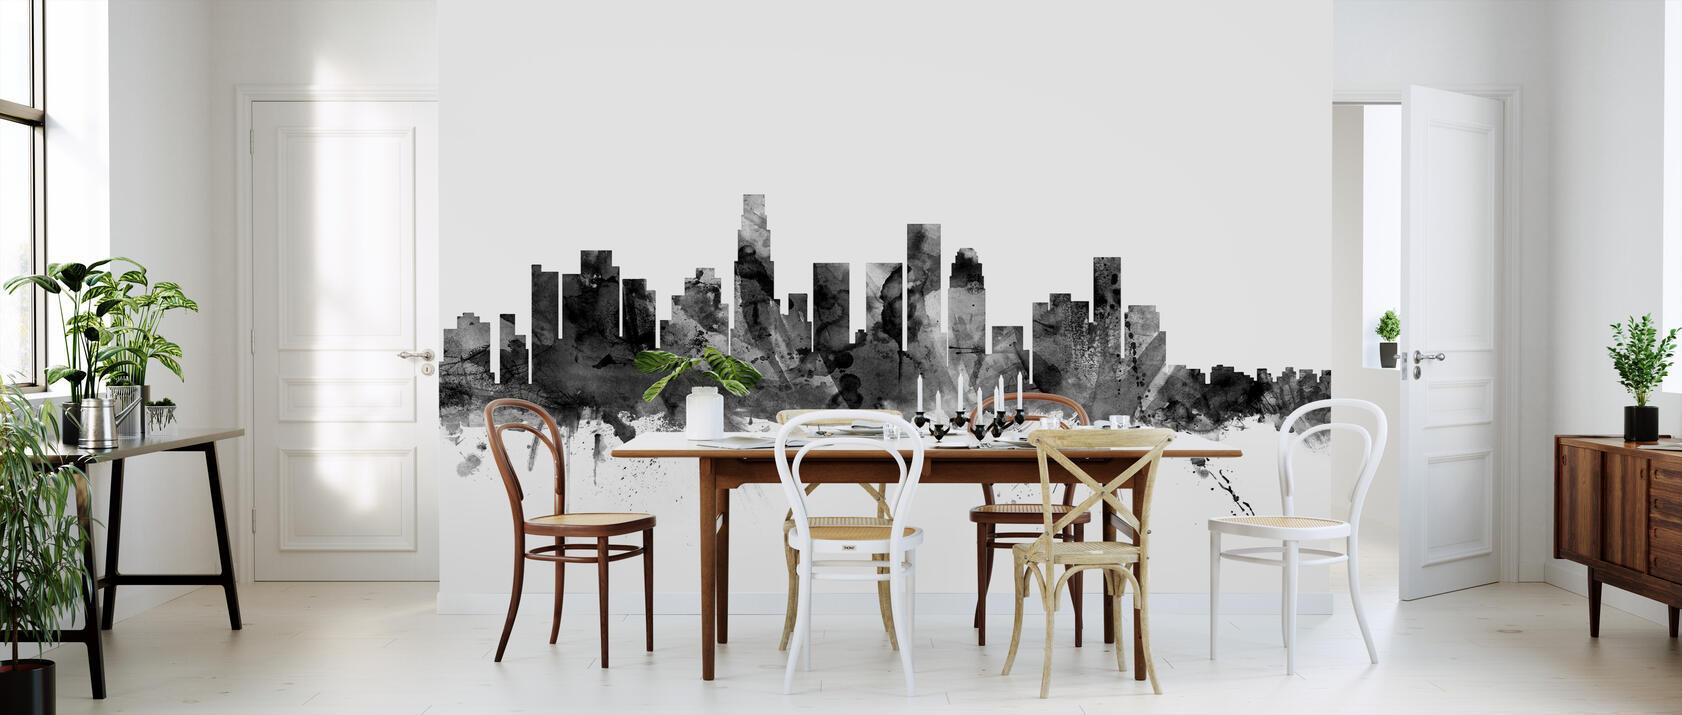 los angeles california skyline black kostenlos gelieferte fototapete von h chster qualit t. Black Bedroom Furniture Sets. Home Design Ideas